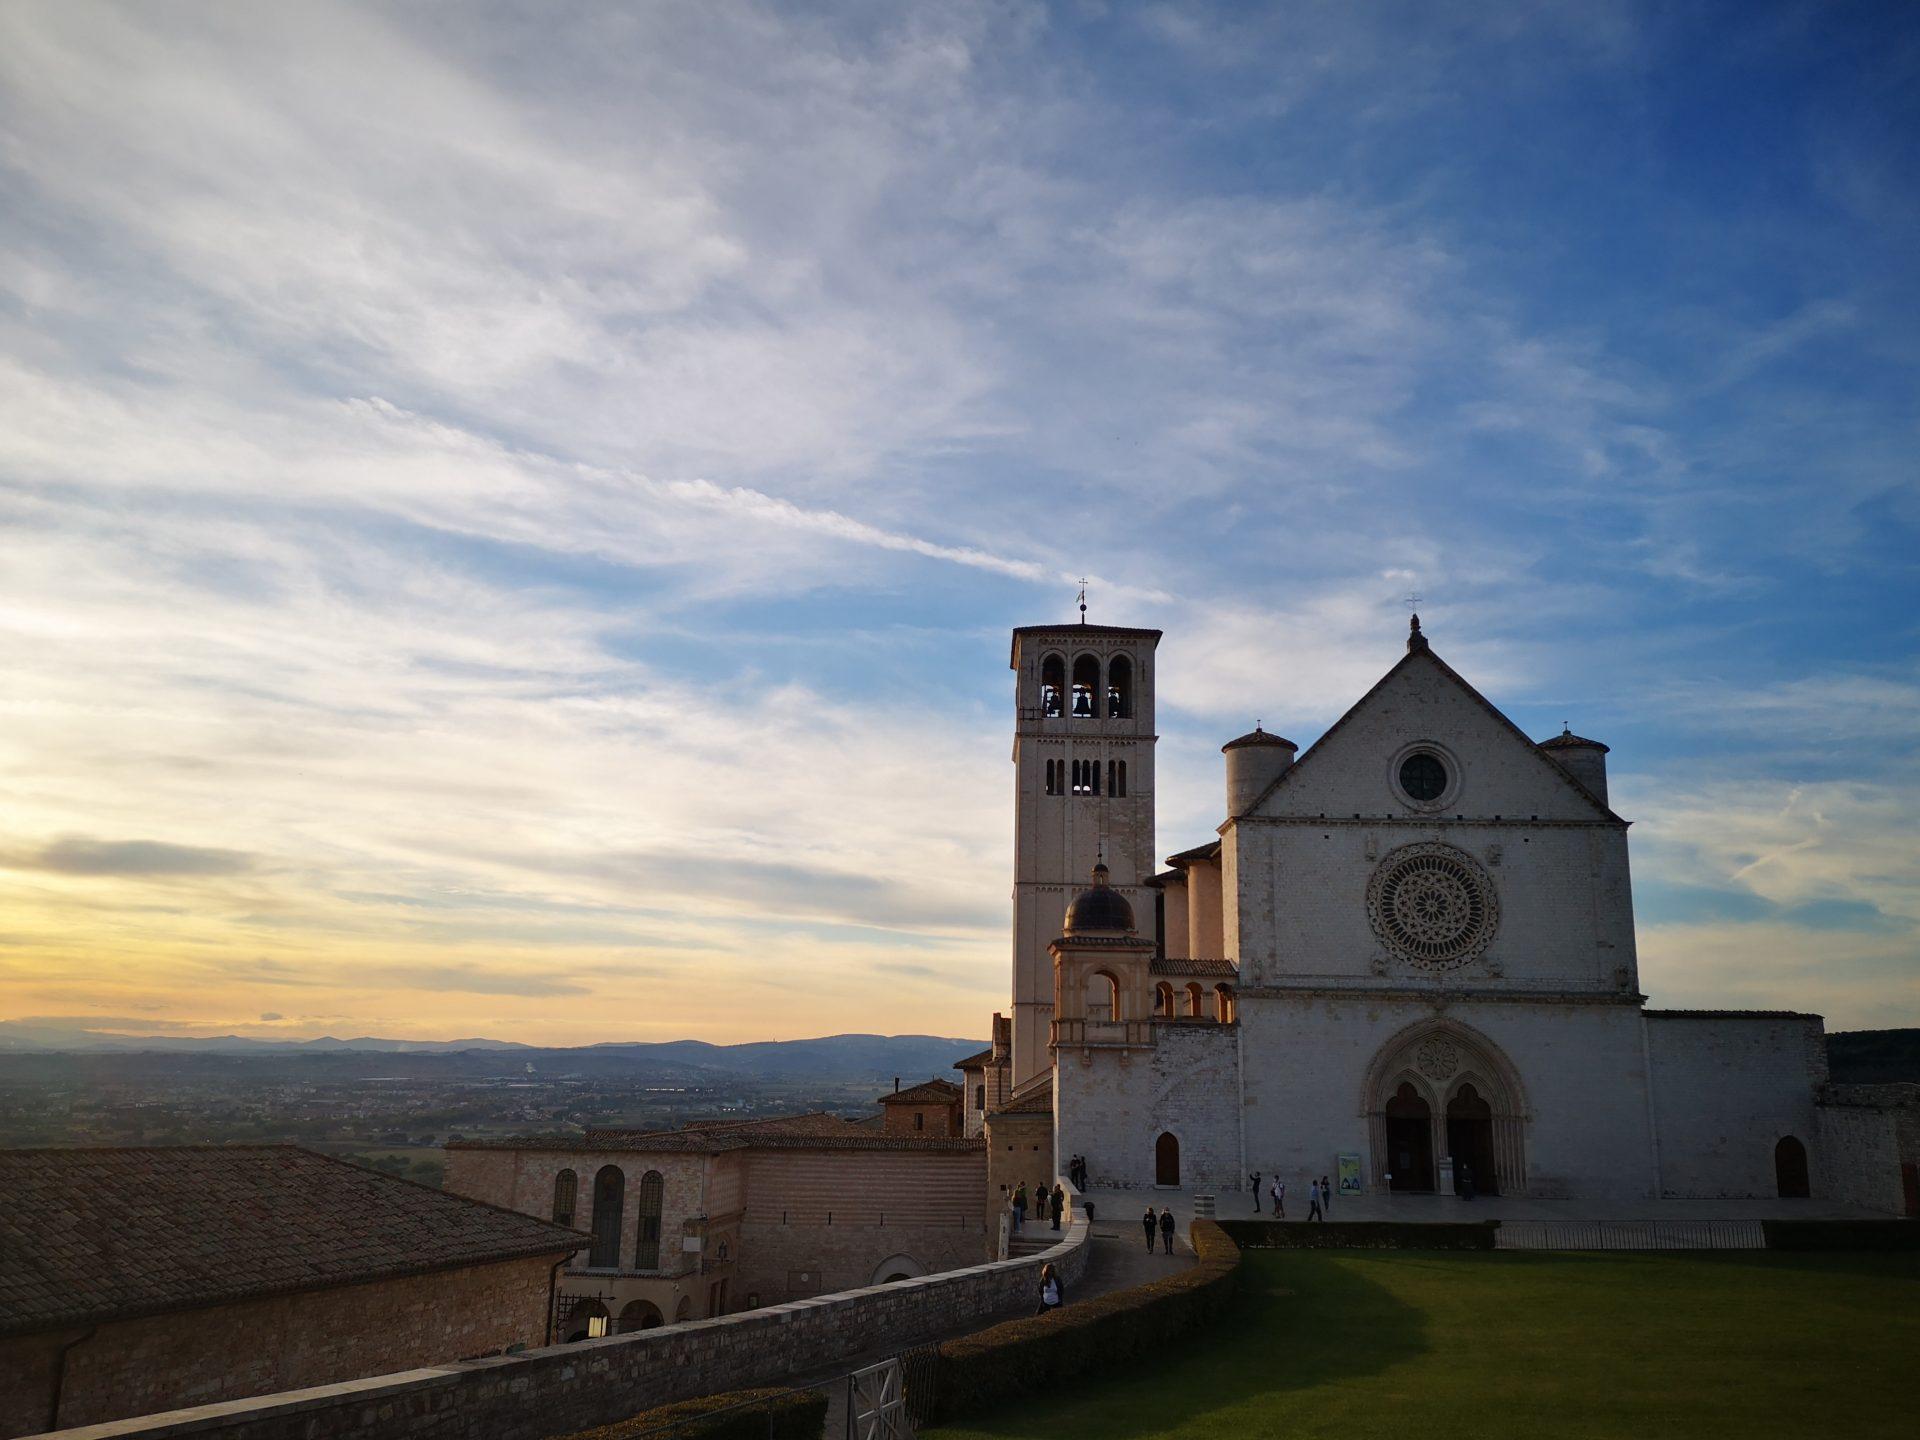 Van Life at Altitude. Italy October 2020